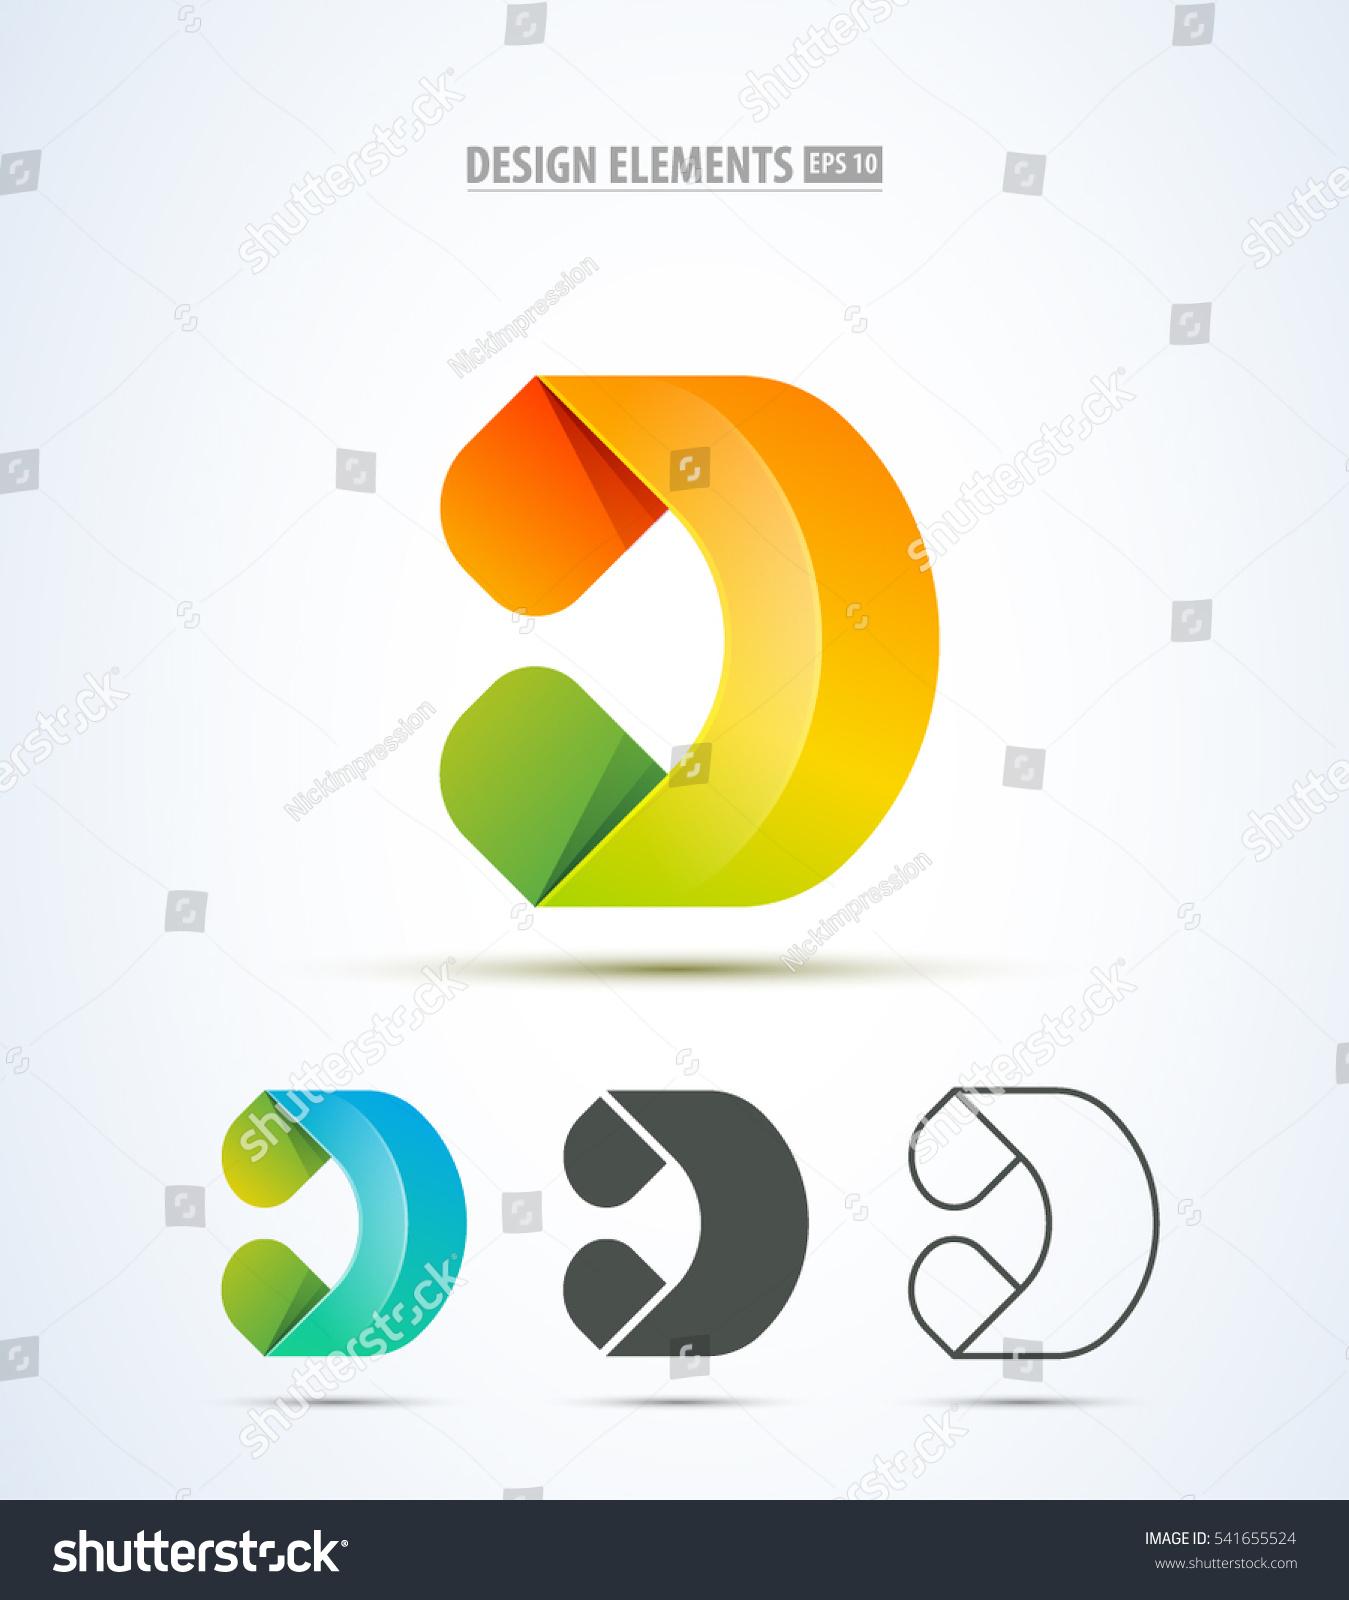 Logo Design Images Stock Photos amp Vectors  Shutterstock